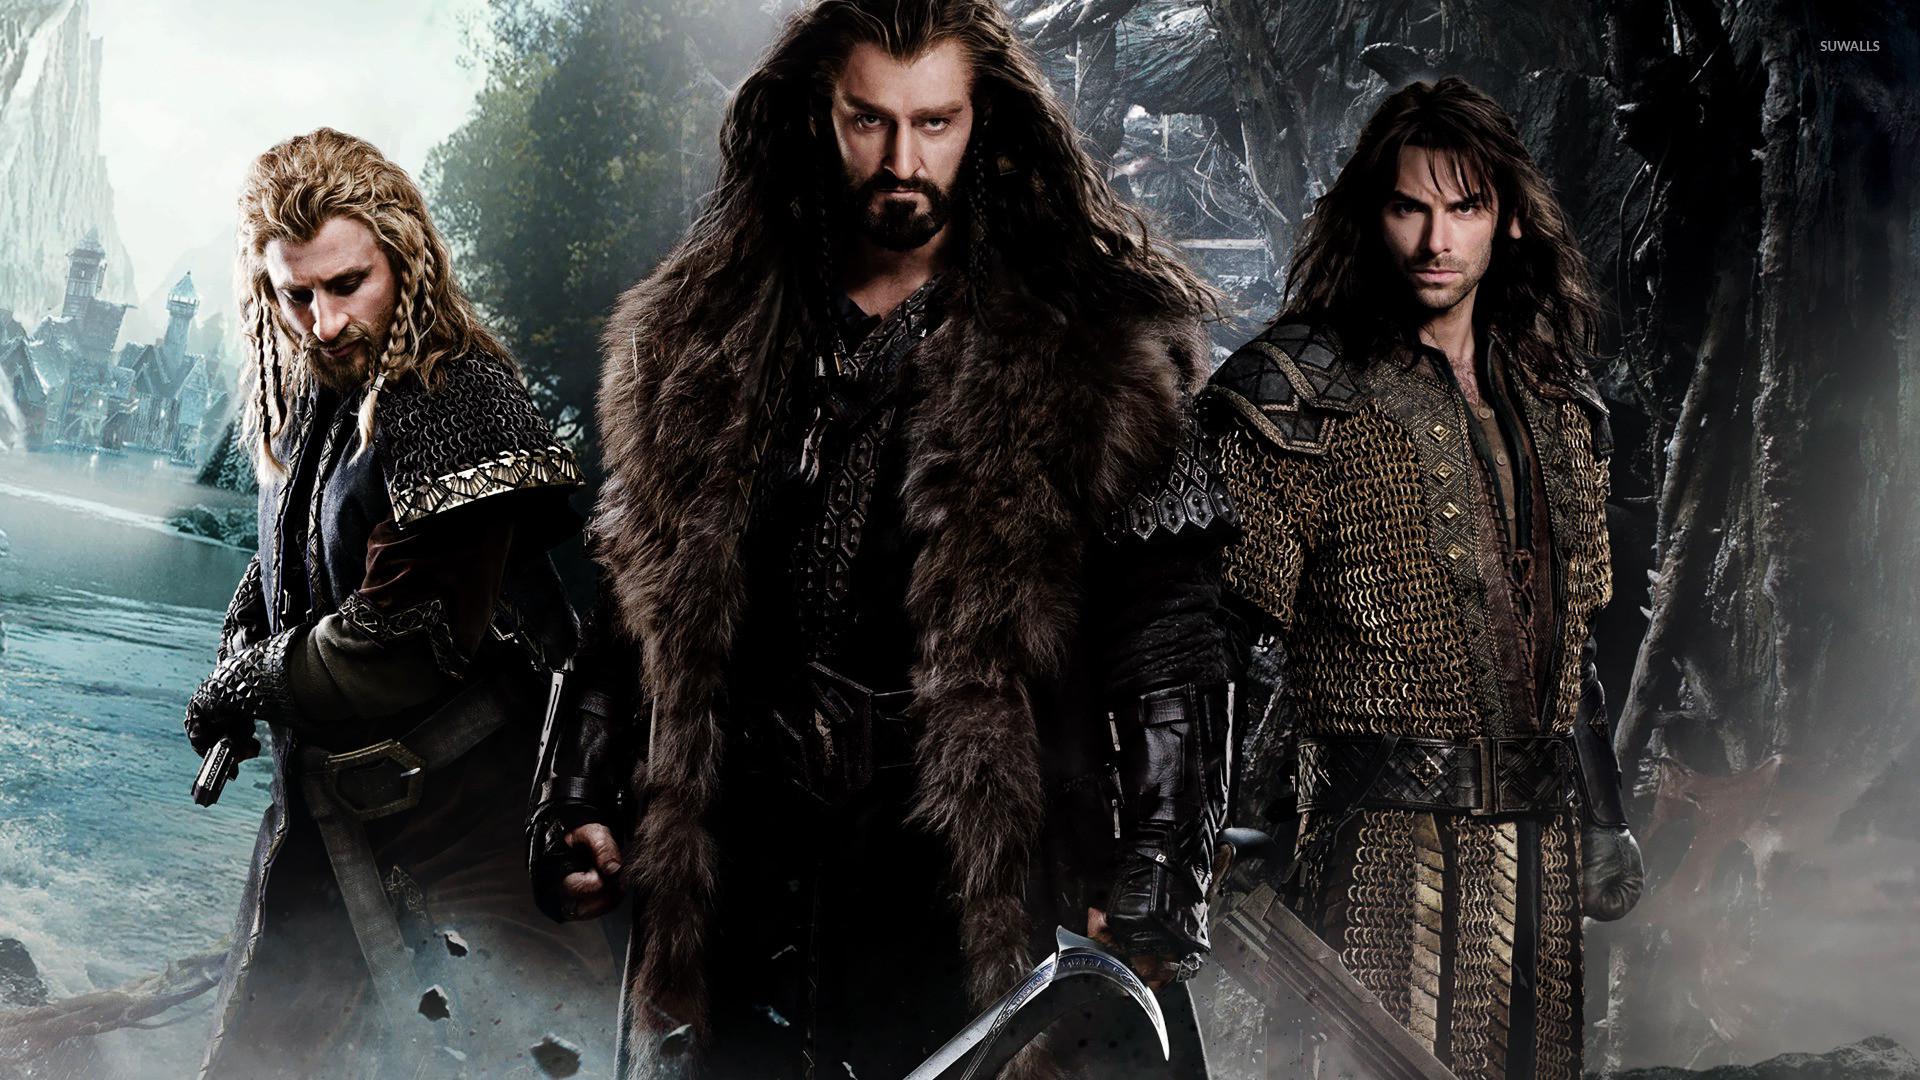 The Hobbit: The Desolation of Smaug [7] wallpaper jpg